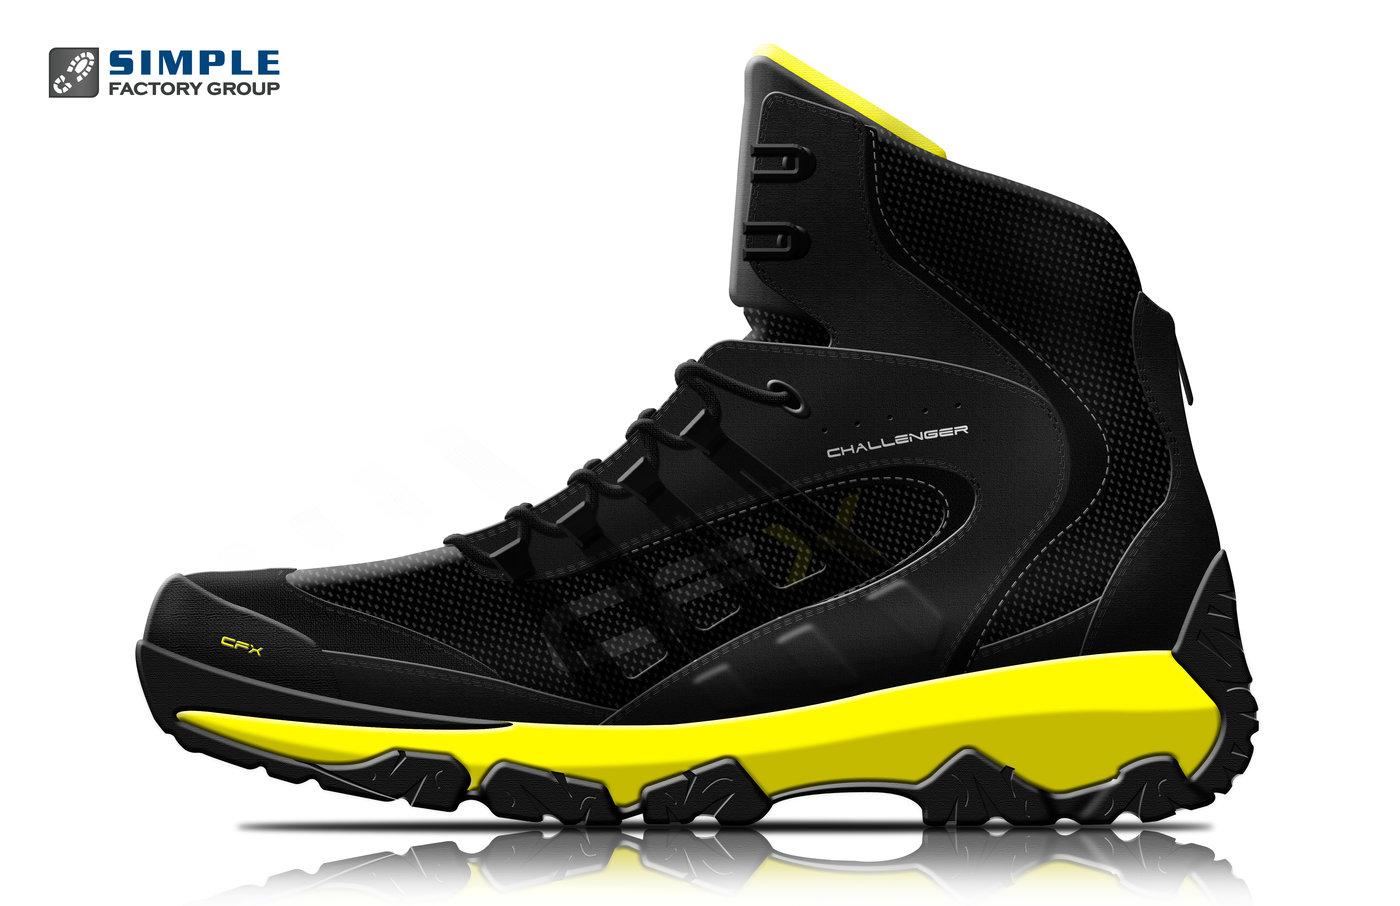 4824468454ba CFX Challenger - Ralph Lauren RLX inspired boot design.